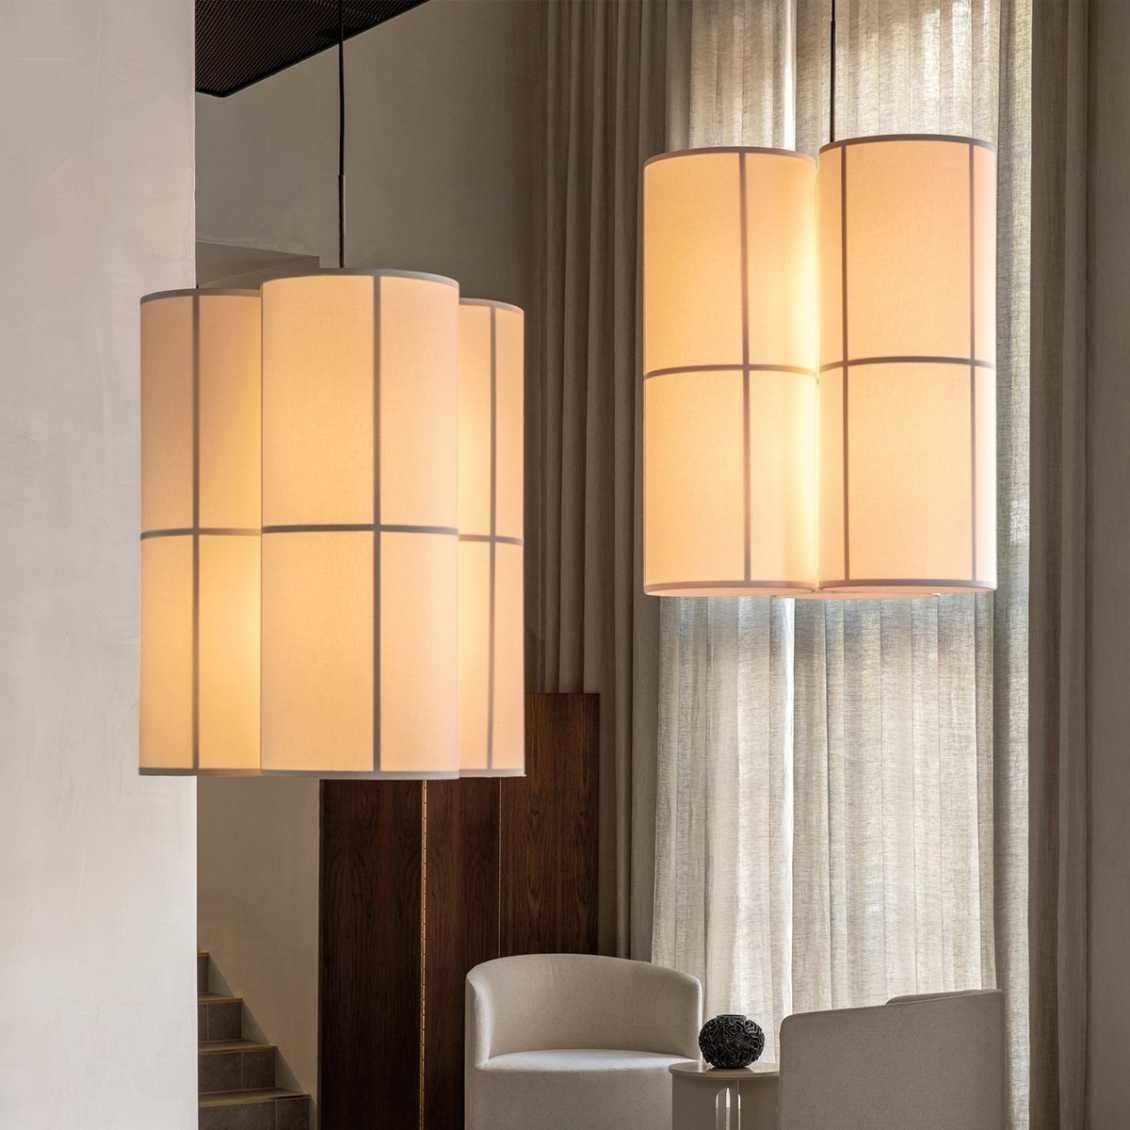 Hashira Cluster Lamp In 2020 Hanglamp Woonkamerlampen Lampen